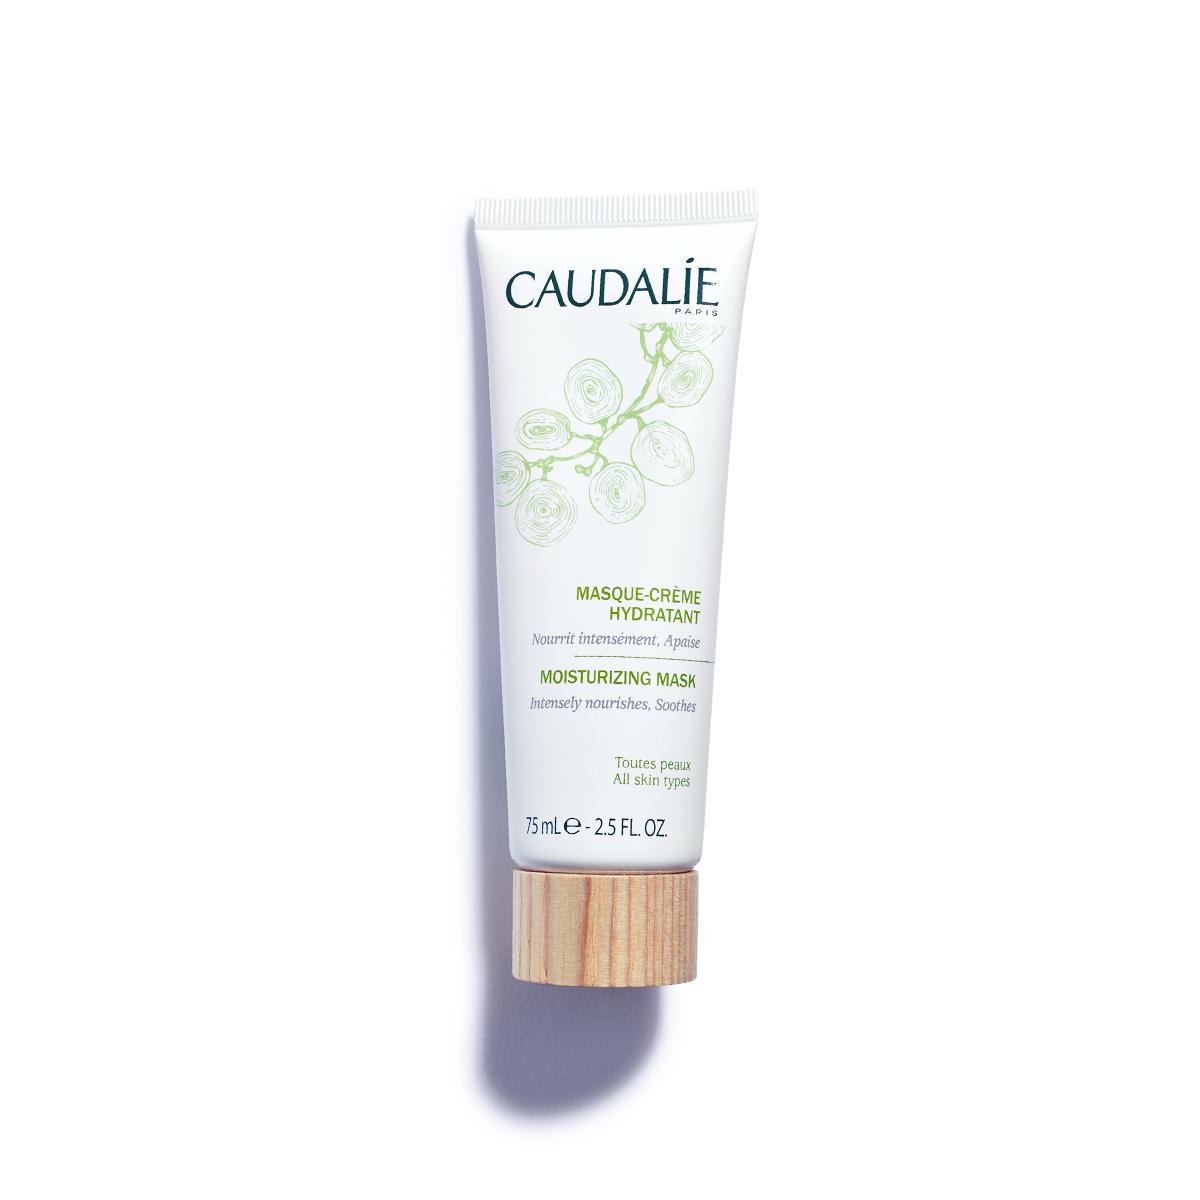 Masque-crème Hydratant